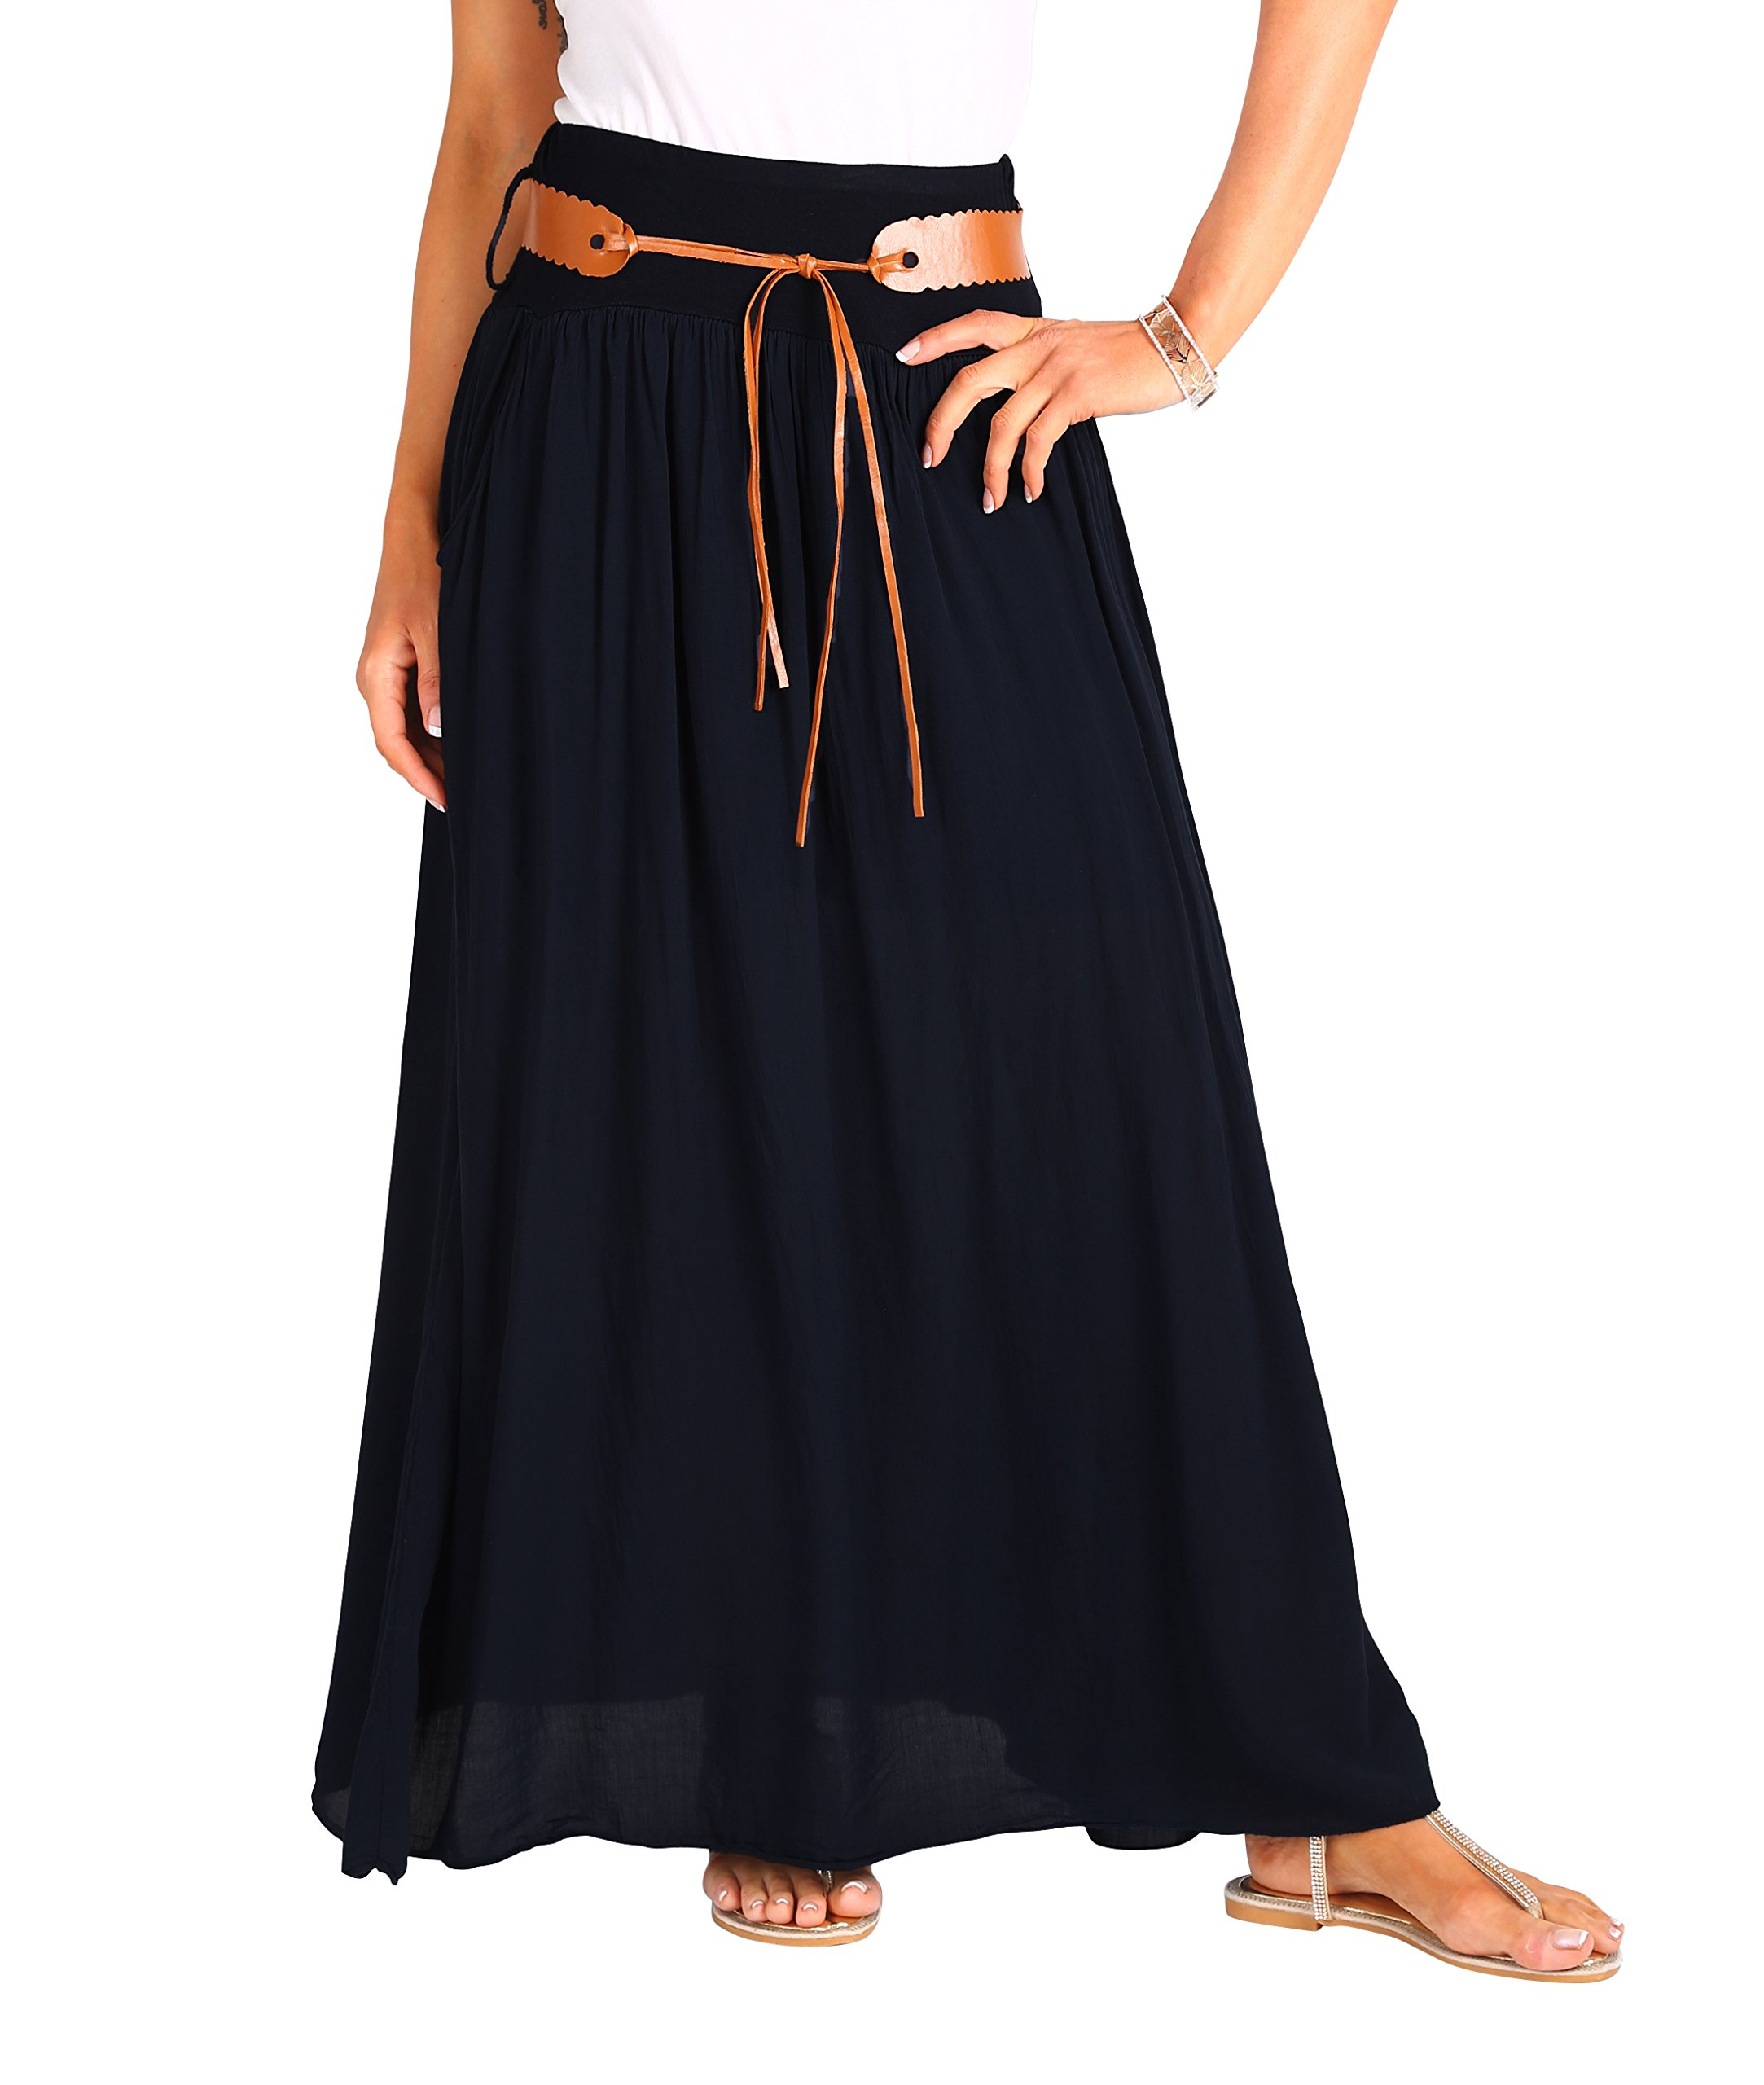 KRISP 4809-BLK-LXL:: Tie Belted Boho Maxi Skirt